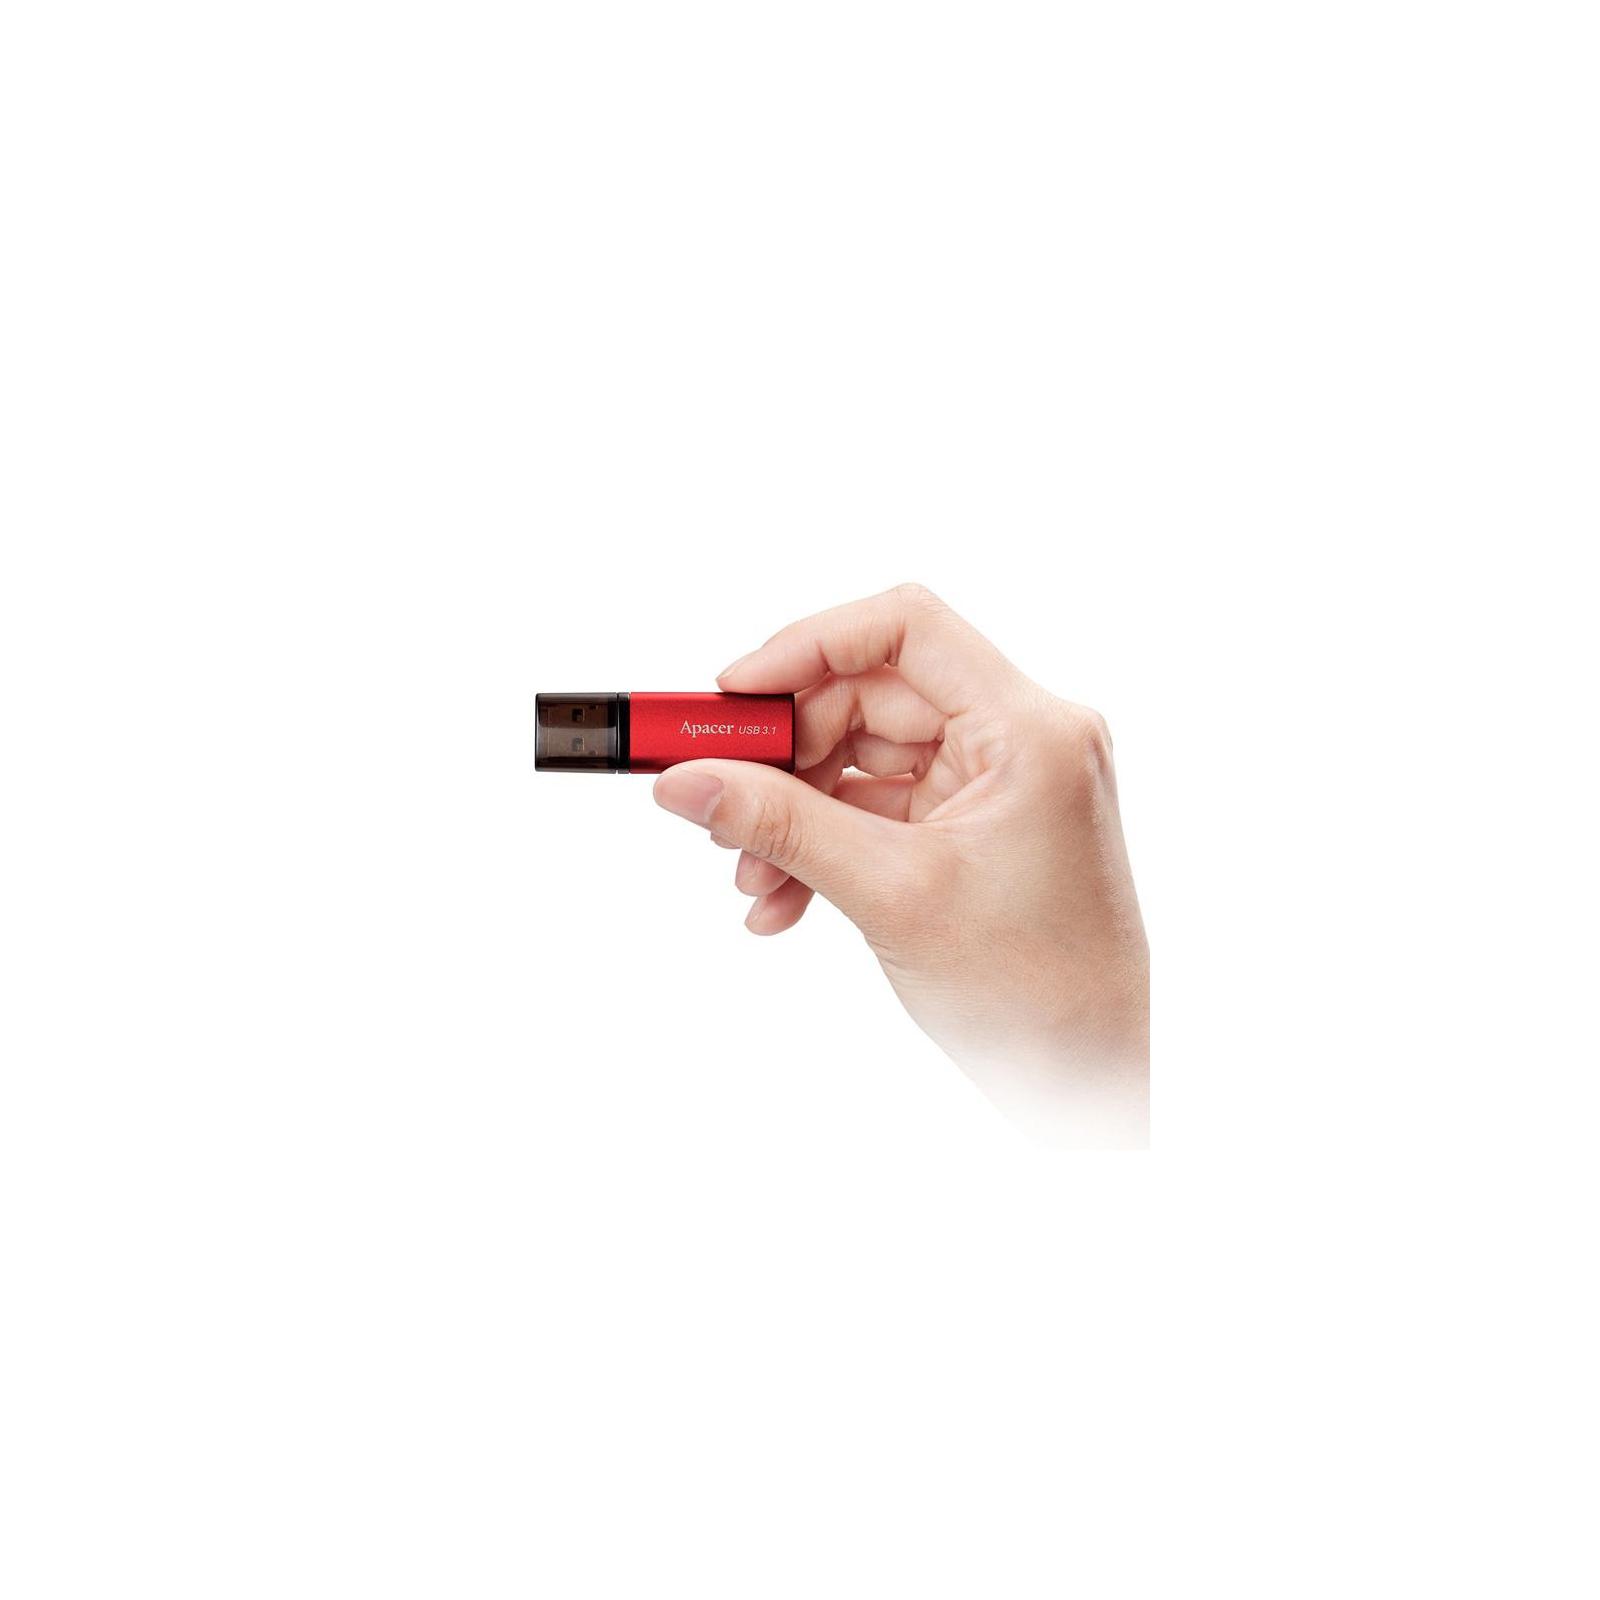 USB флеш накопитель Apacer 128GB AH25B Red USB 3.1 Gen1 (AP128GAH25BR-1) изображение 4